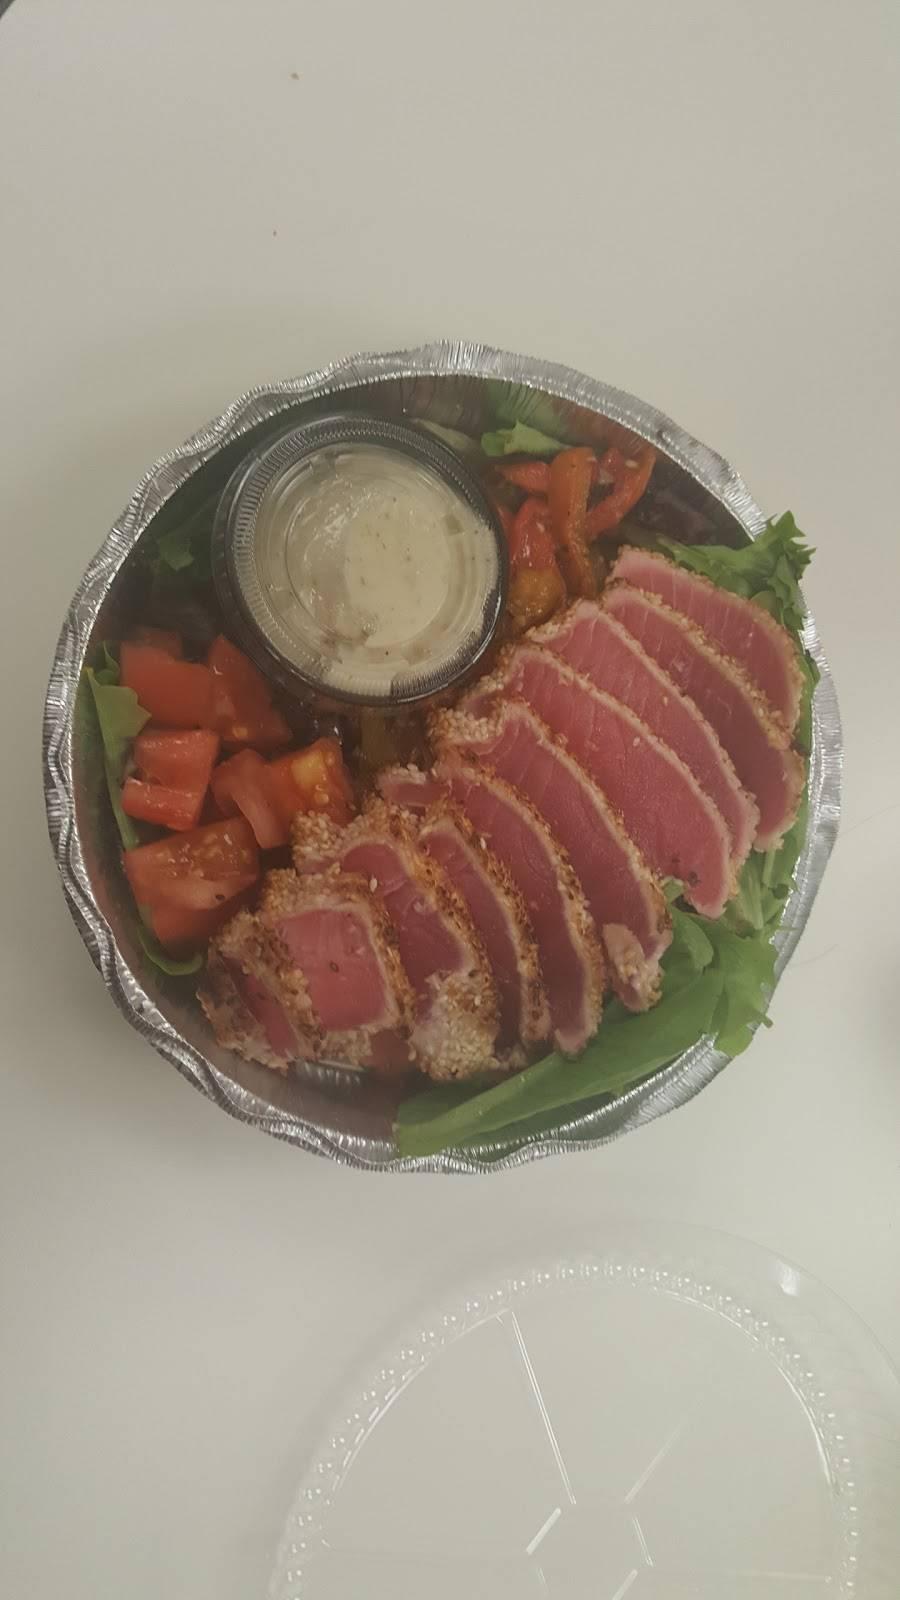 Filomenas Deli | meal takeaway | 143 Front St, Secaucus, NJ 07094, USA | 2013302811 OR +1 201-330-2811